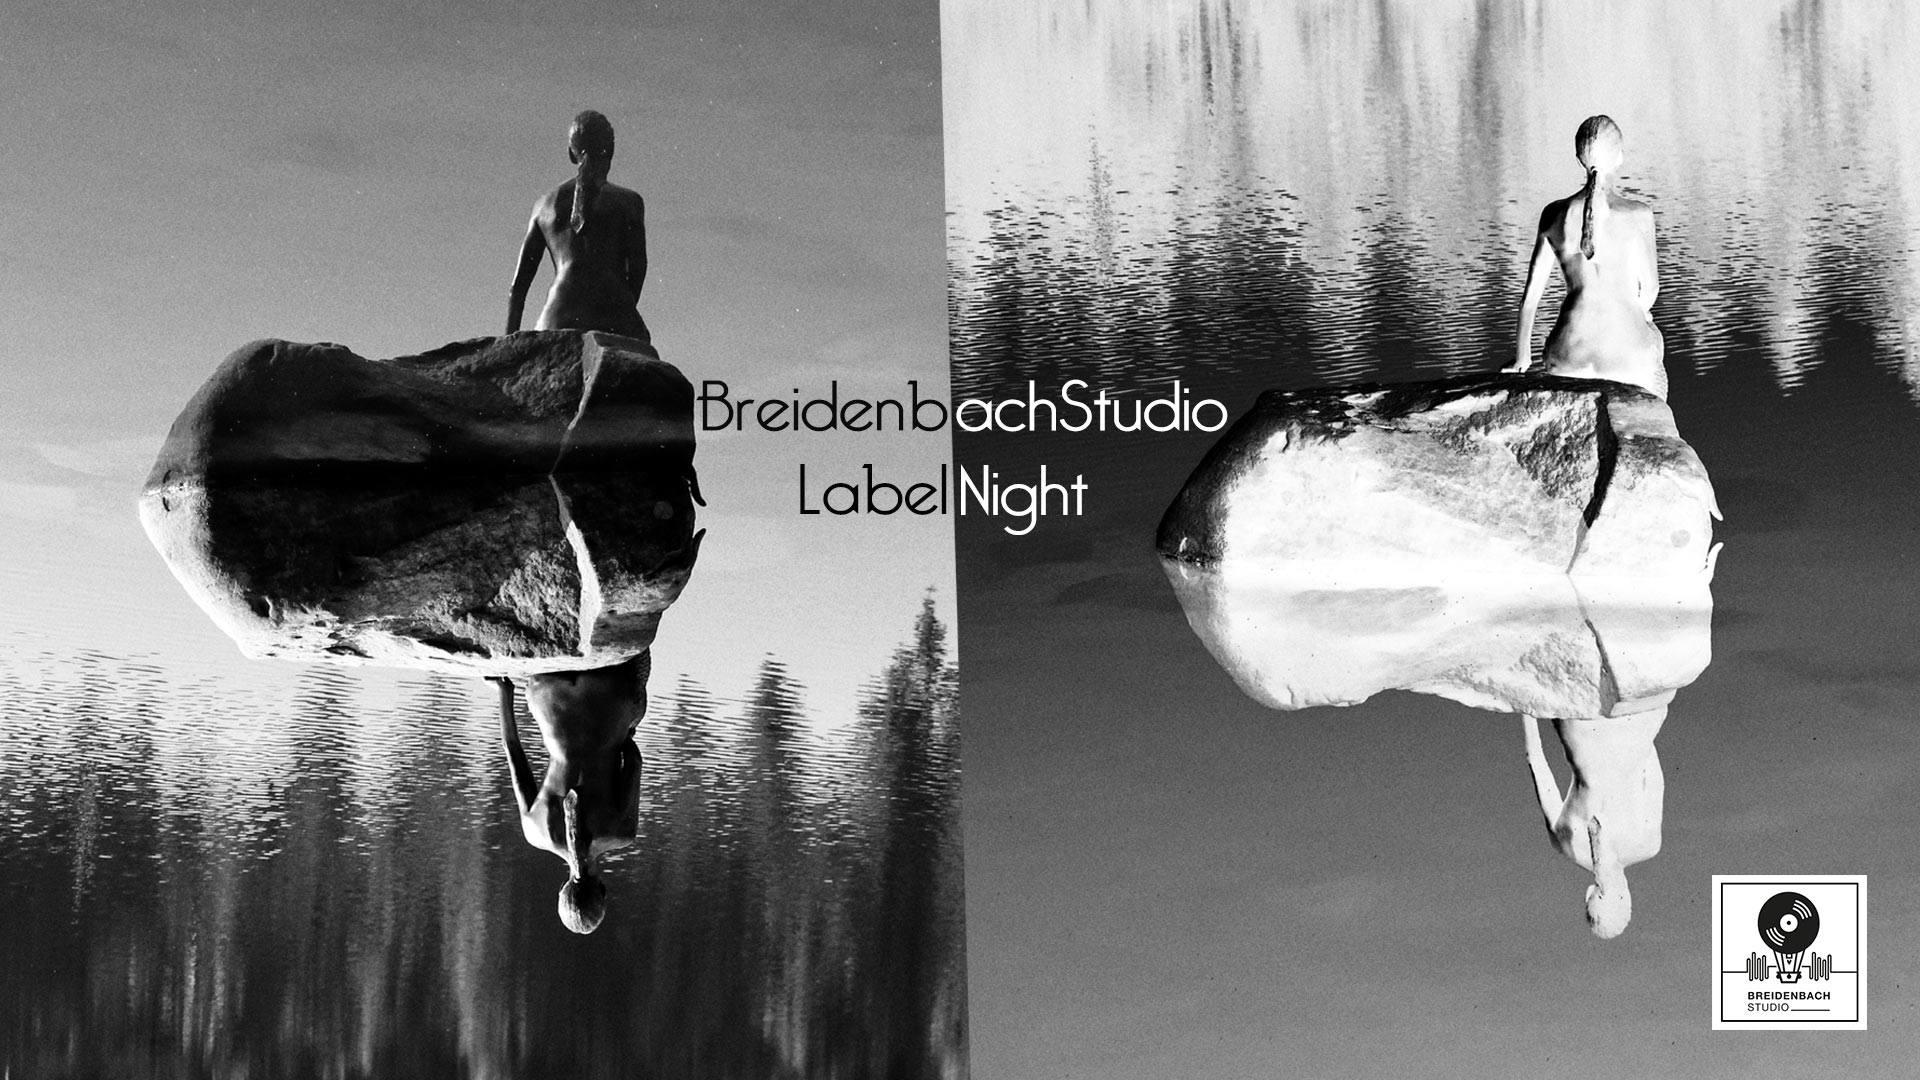 BreidenbachStudio Labelnight || 2.11.18